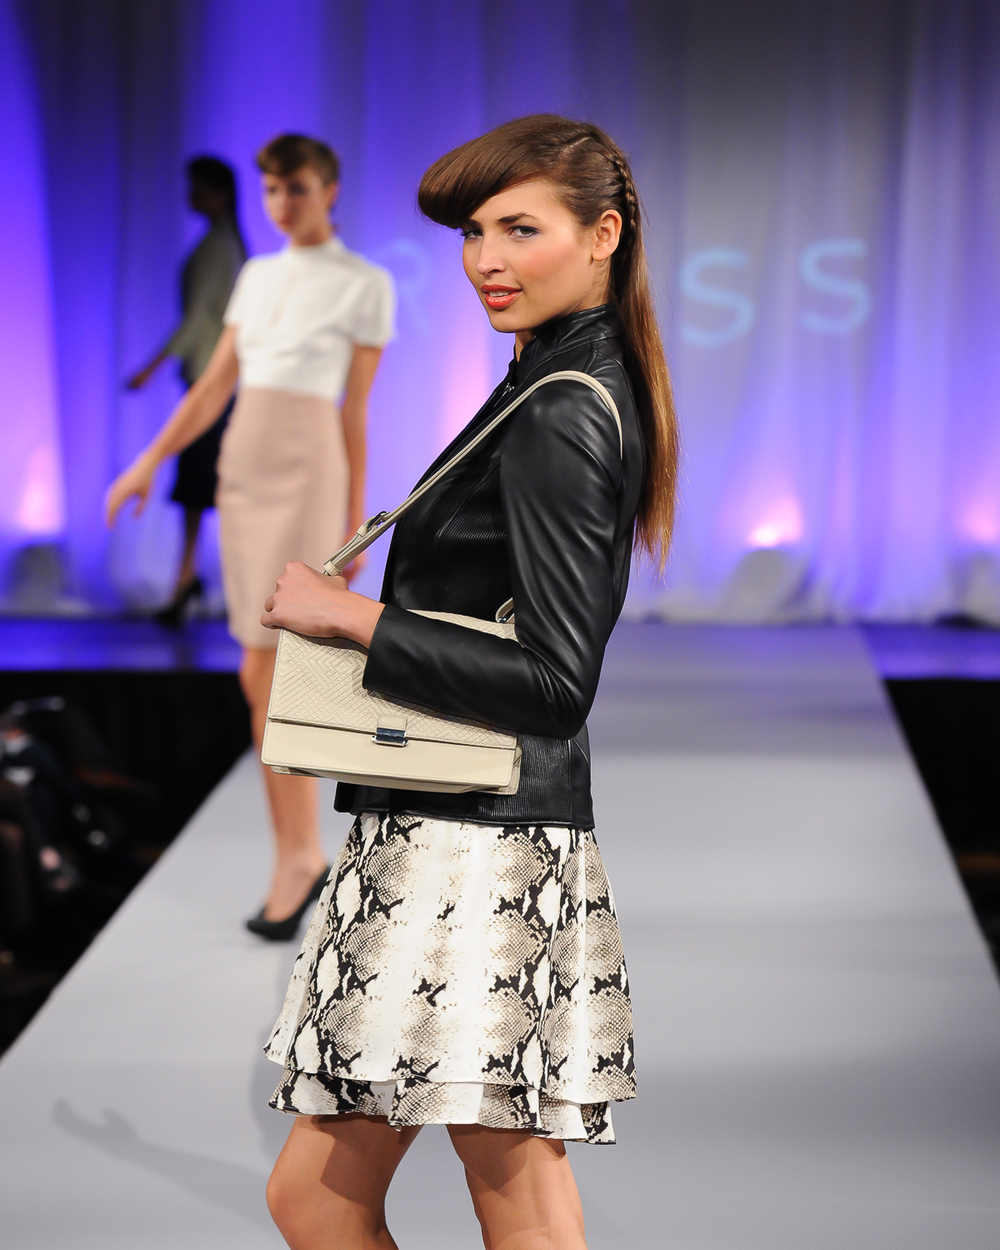 bristol-fashion-photographer-10.jpg